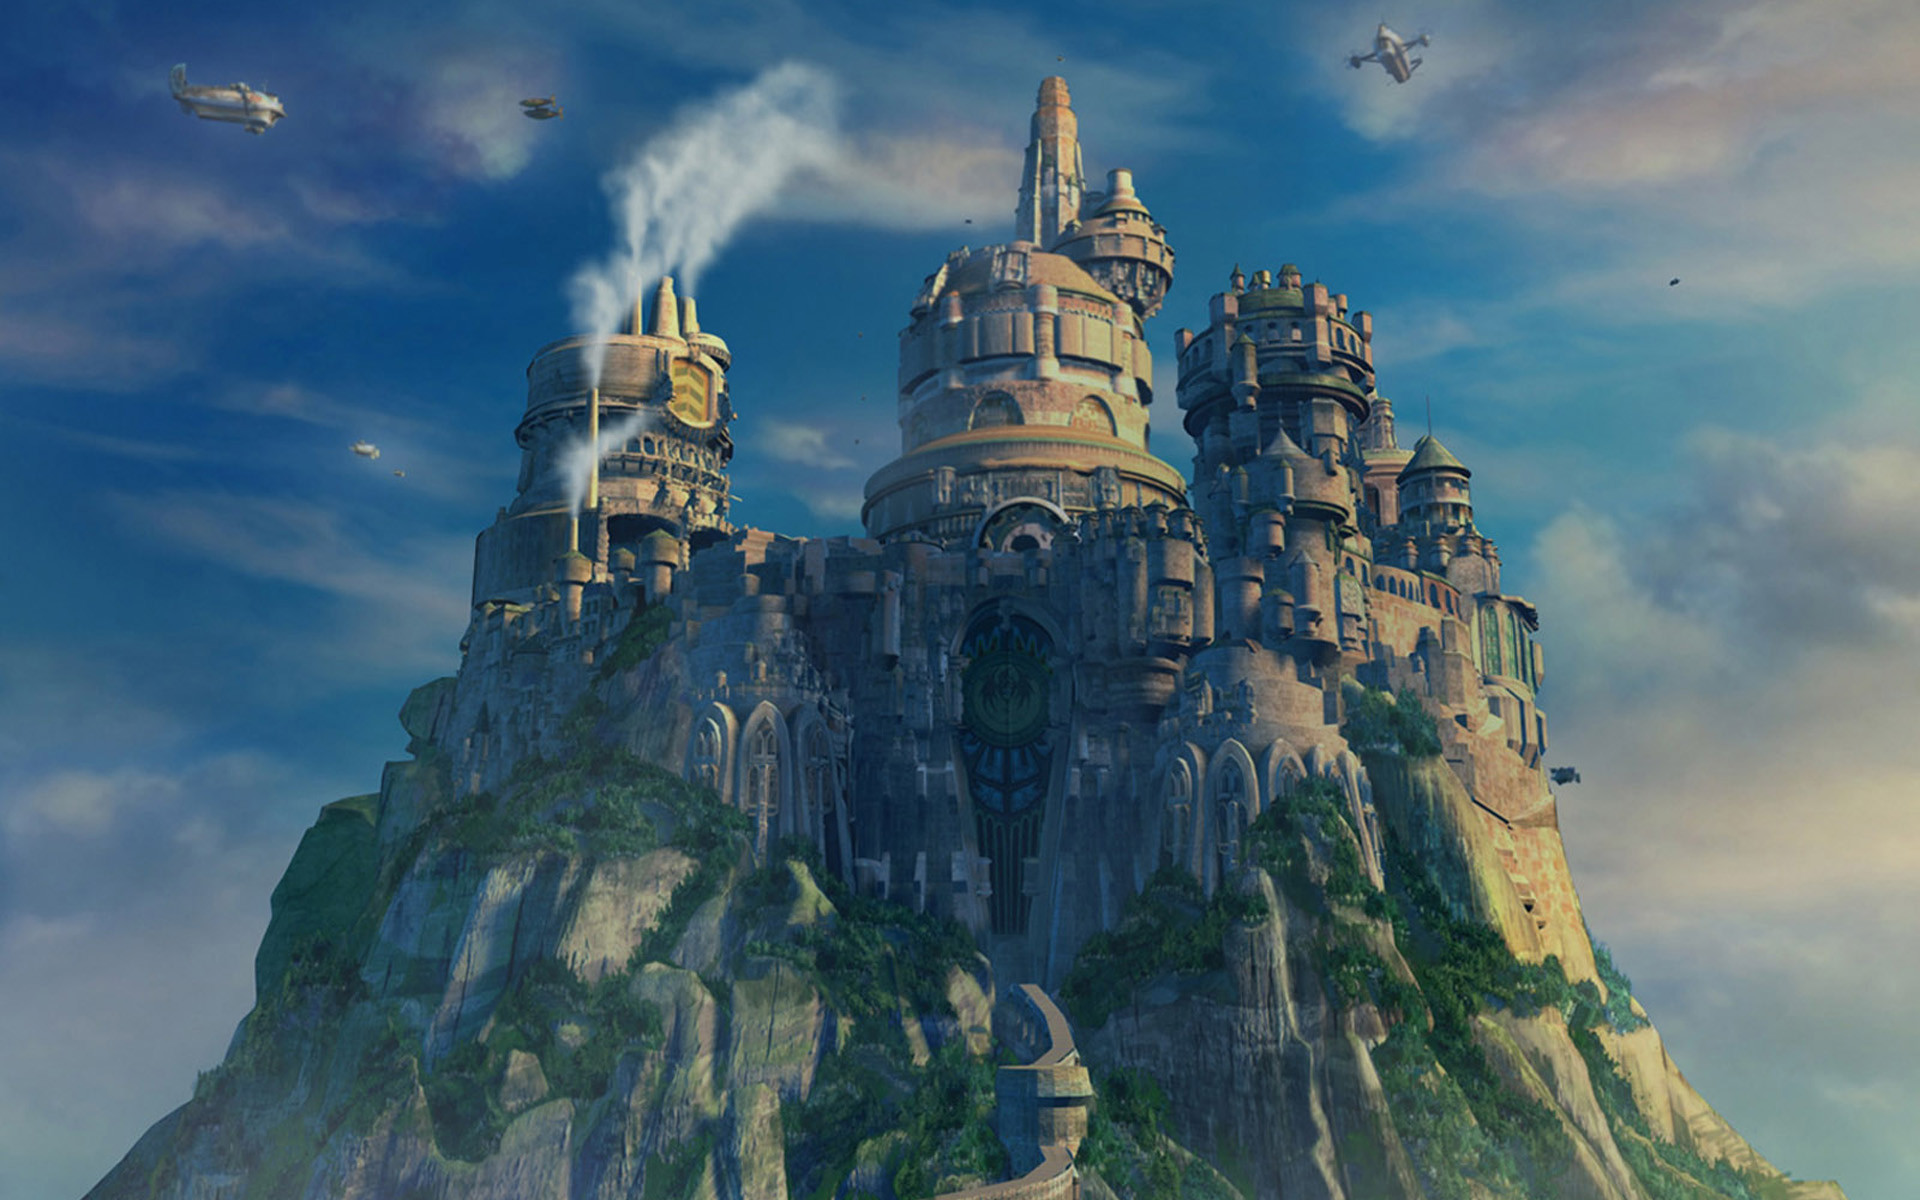 Castles Final Fantasy IX Yoshitaka Amano wallpaper     73653    WallpaperUP